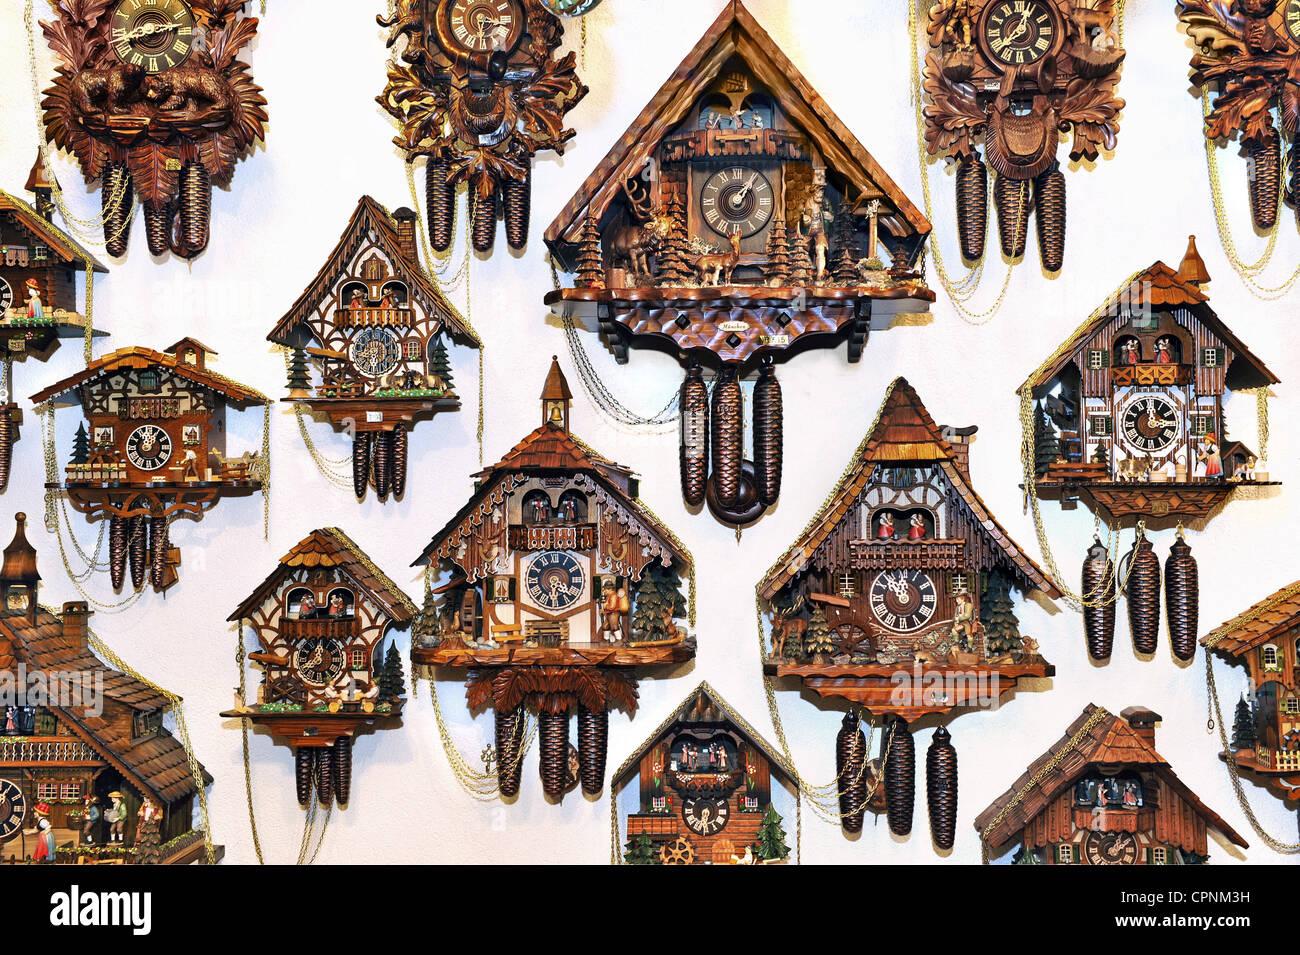 Clock Cuckoo Clock Black Forest Cuckoo Clocks Hanging